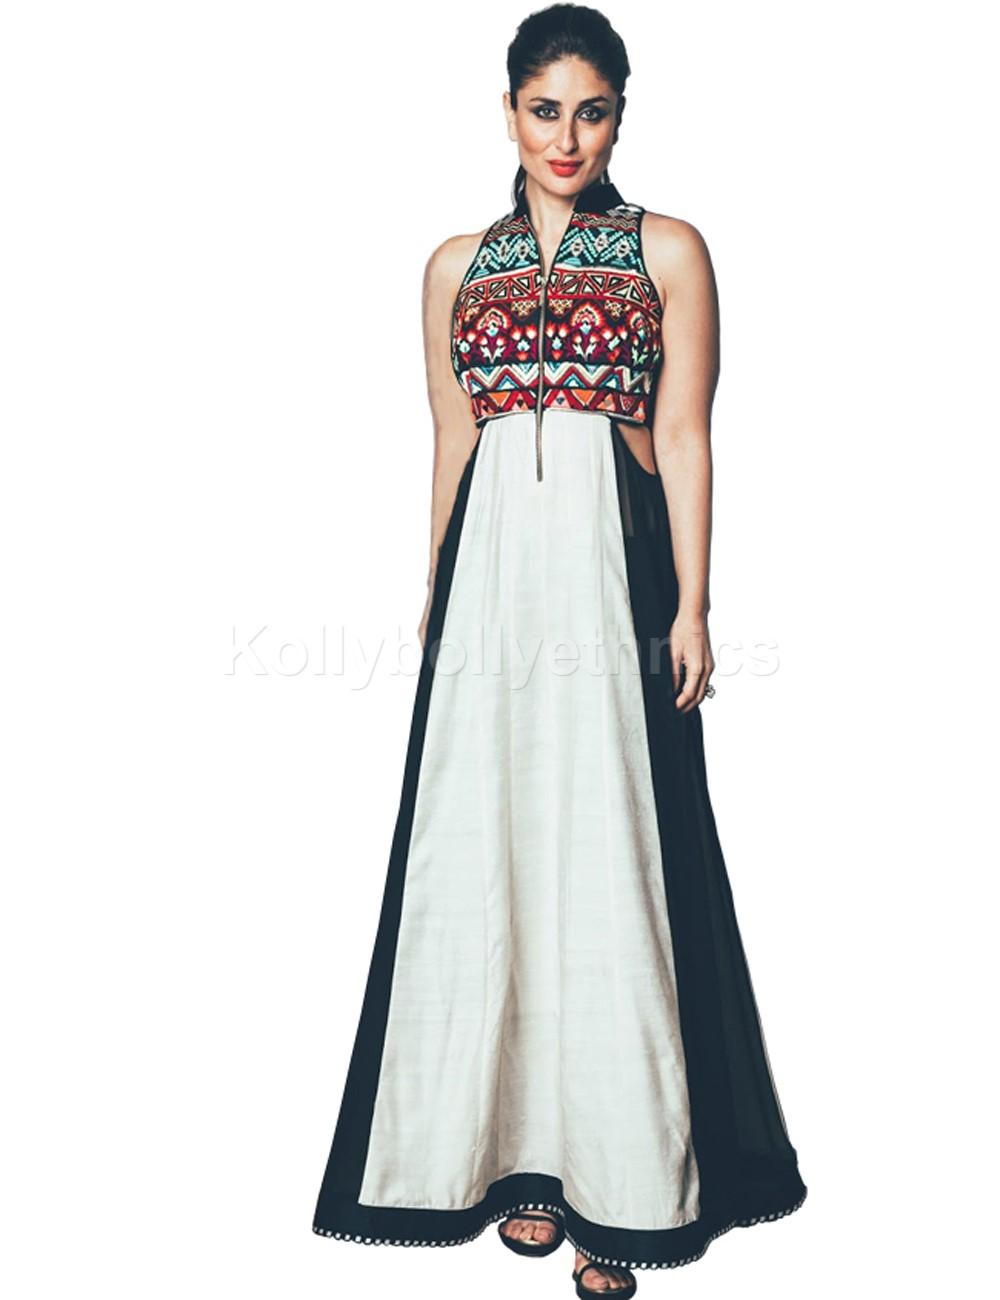 b2f655d16f02b Buy Bollywood Style Kareena kapoor white and black raw silk kurti ...